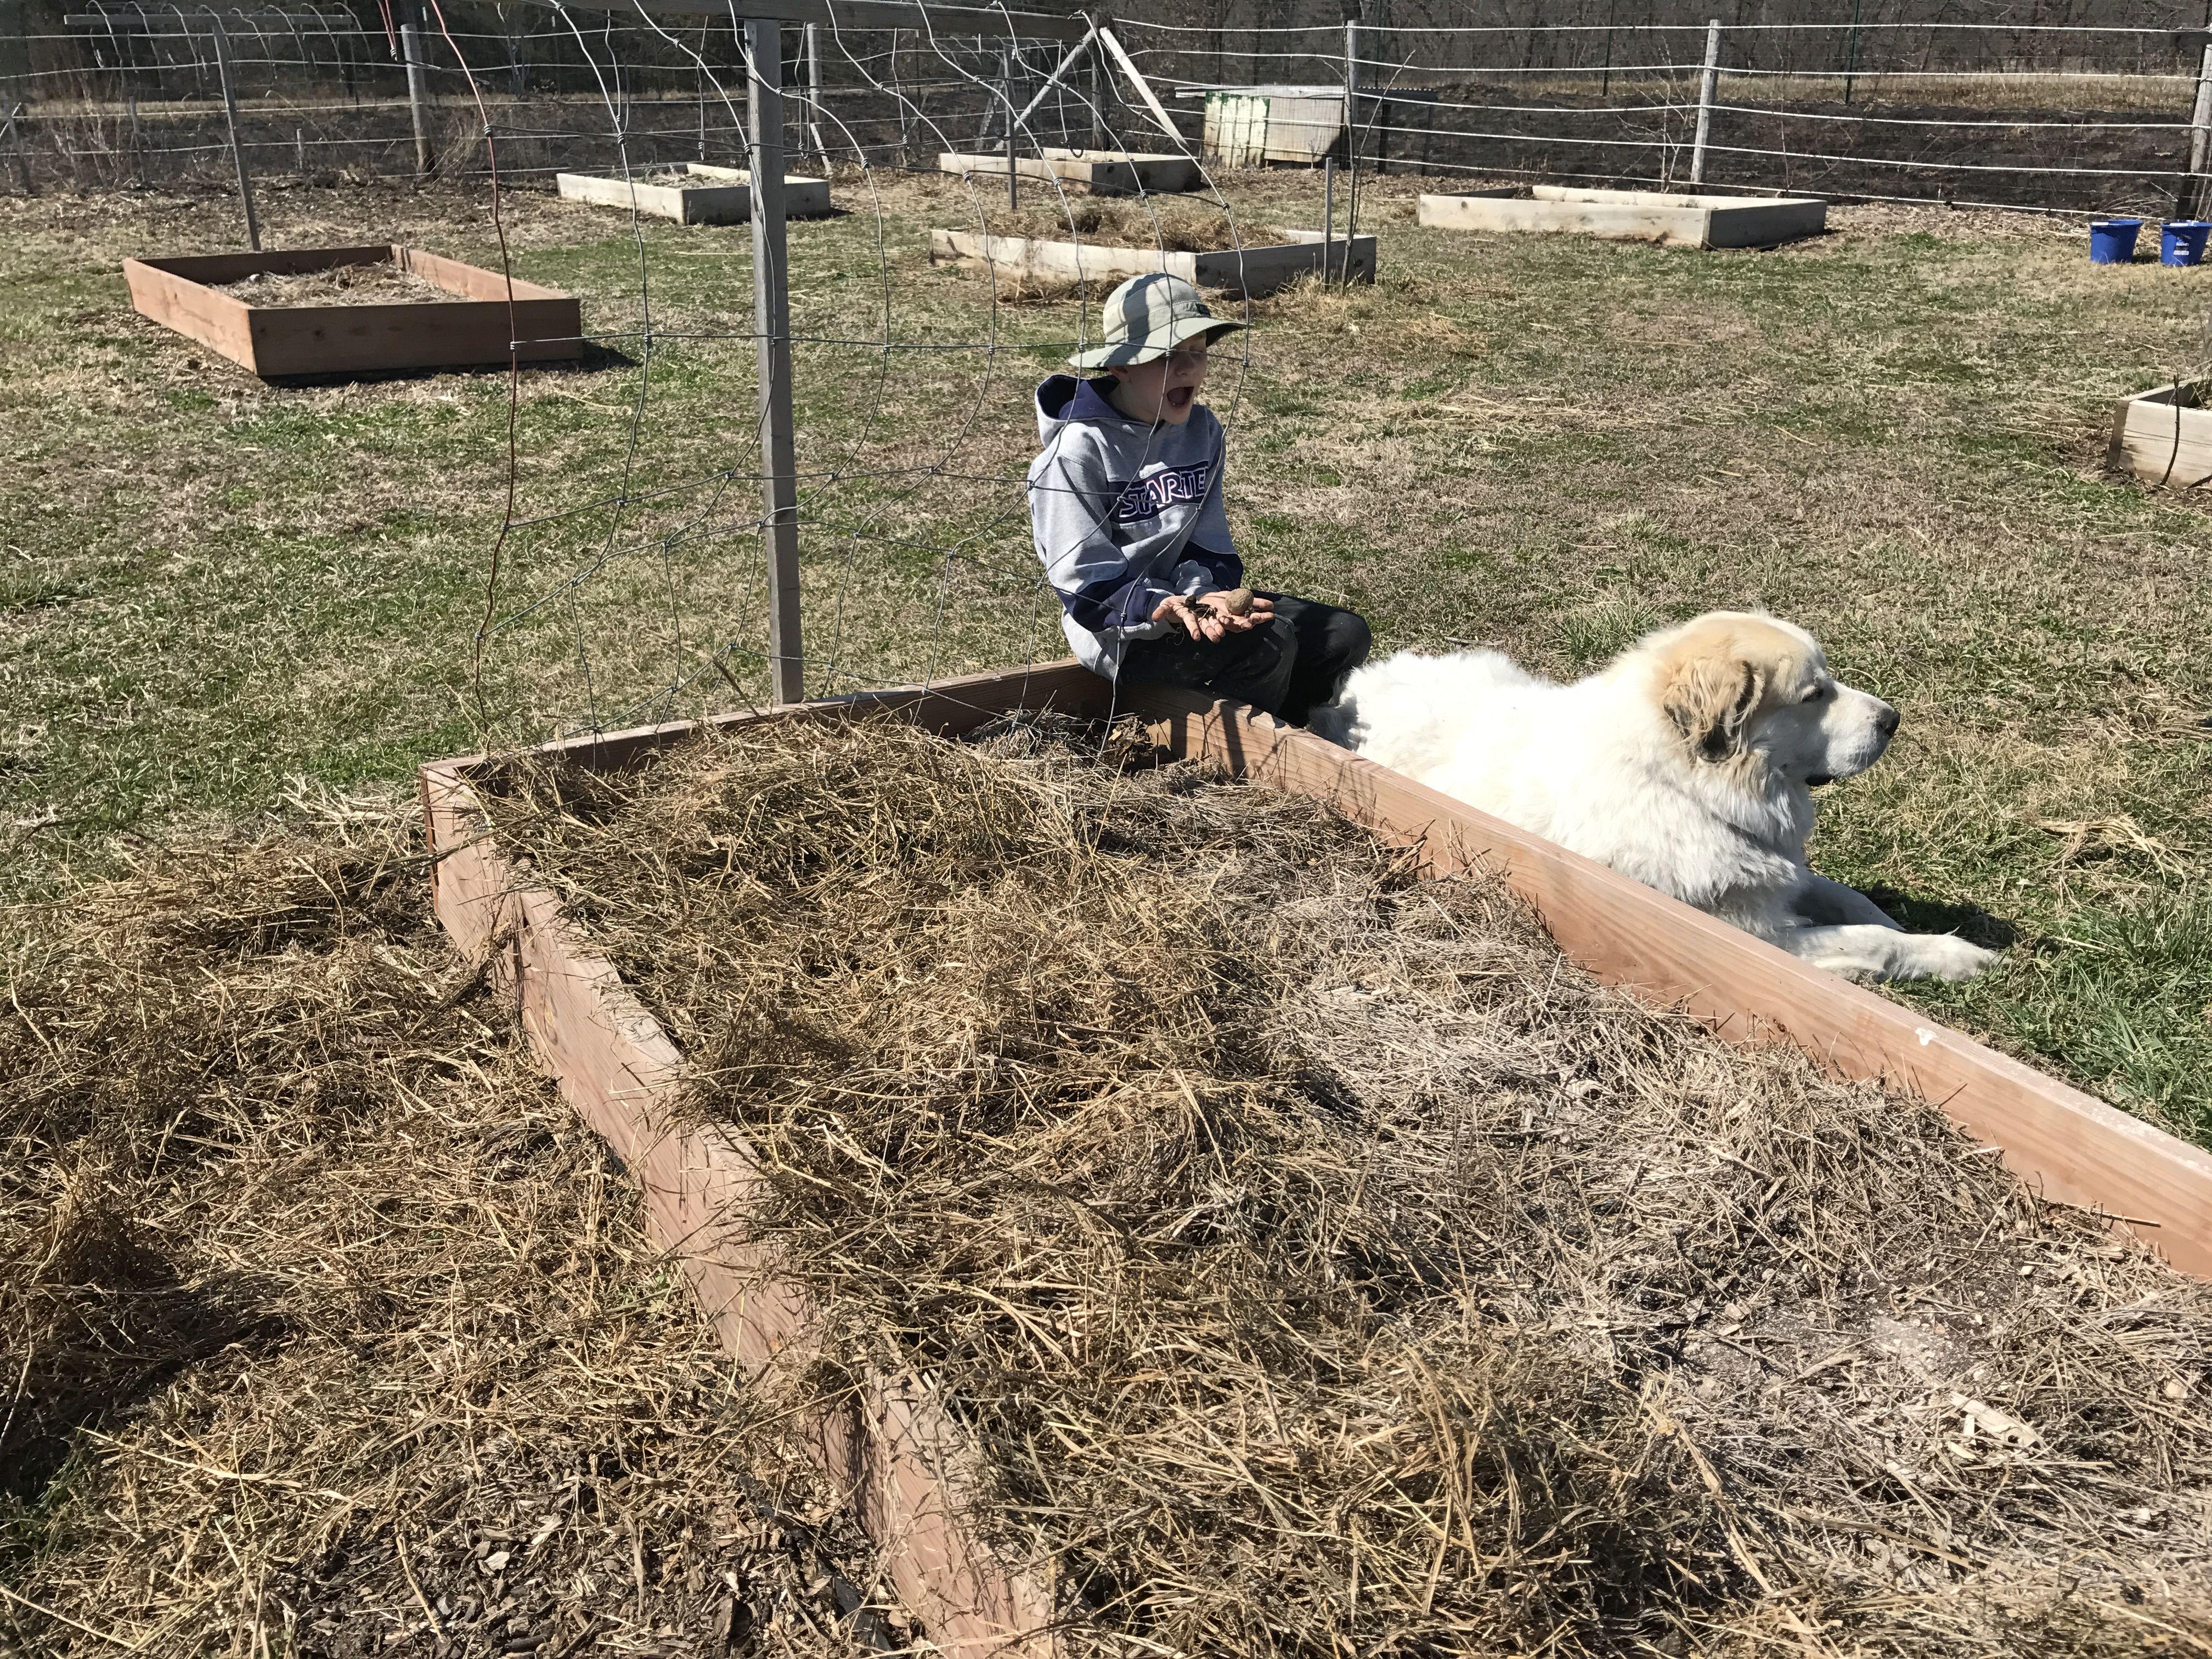 Pin by Cathy Grisham on Farm life Farm life, Hobby farms